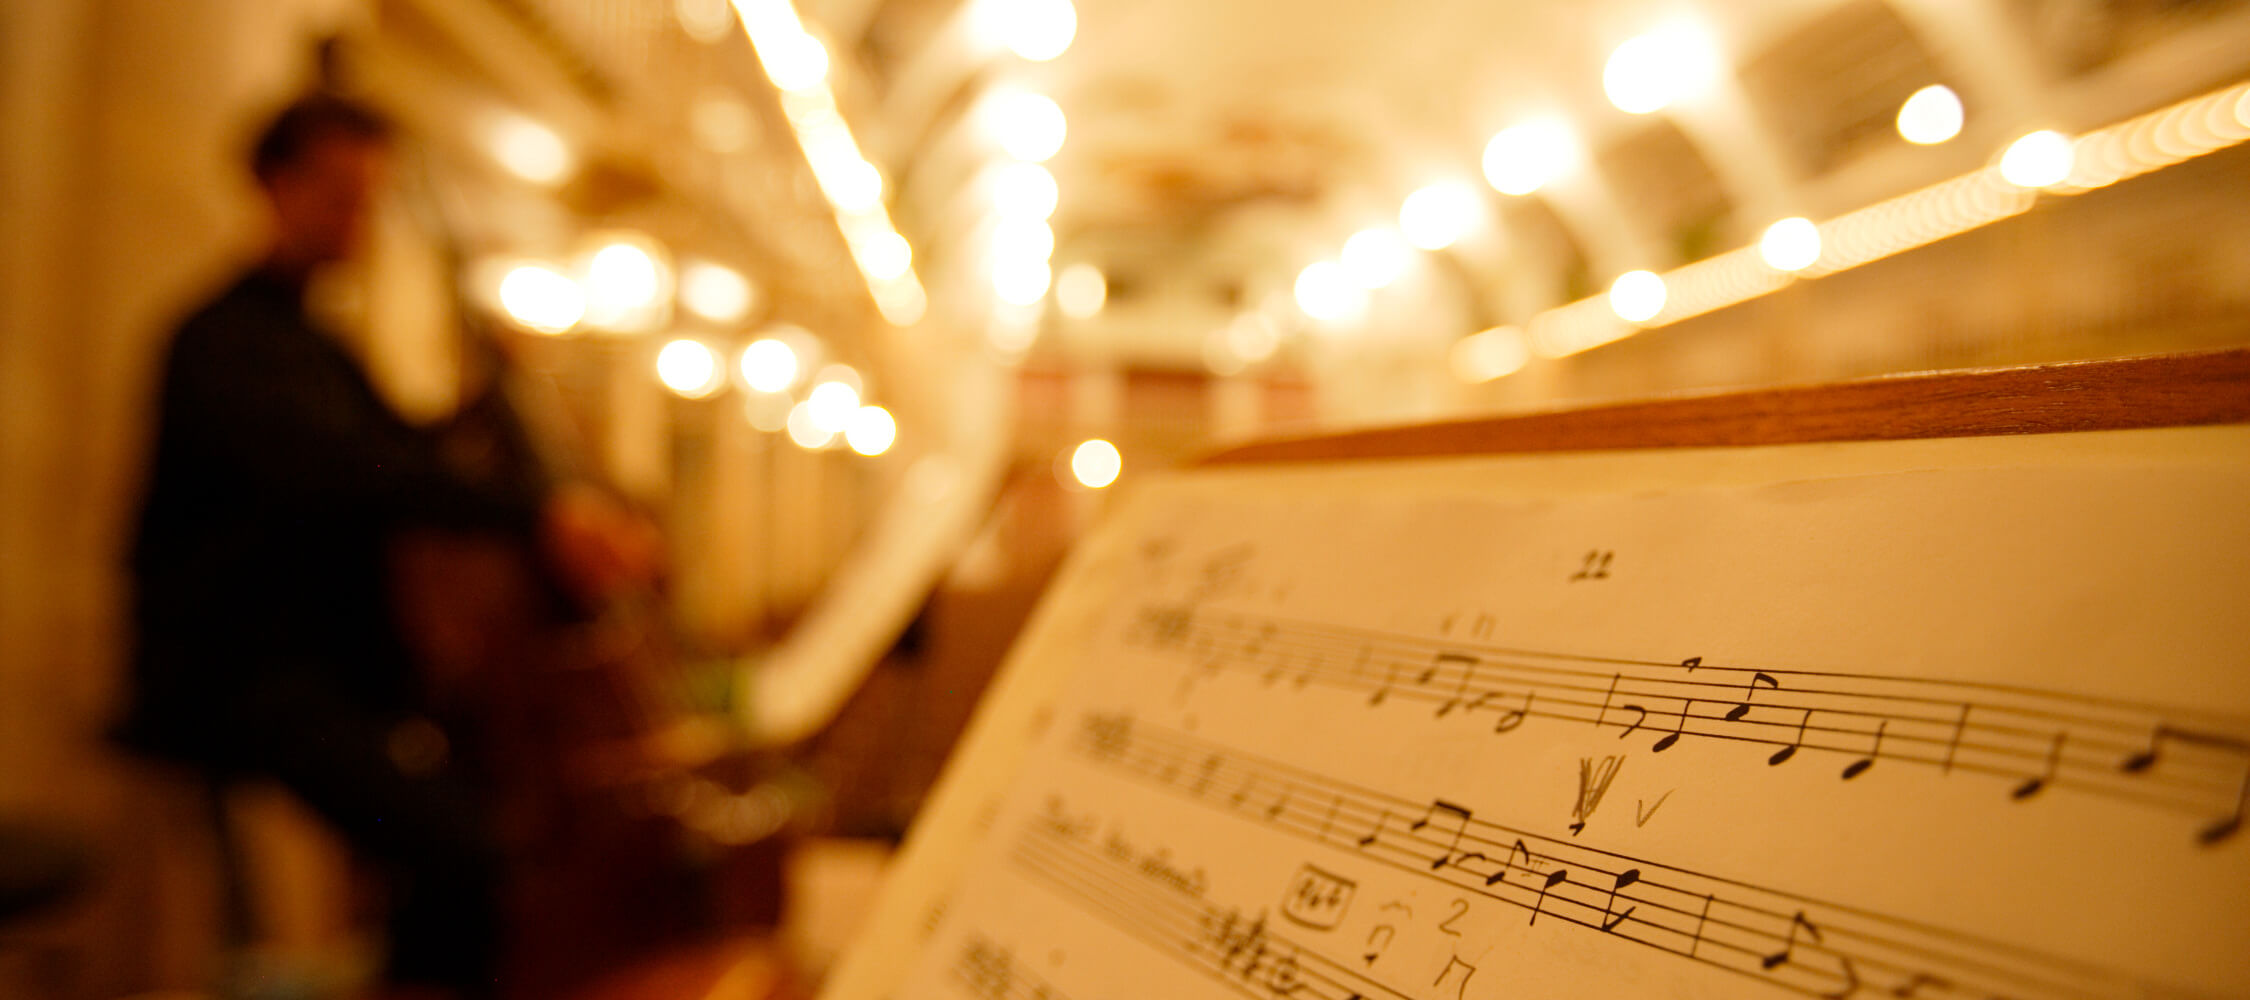 Italien-Trentino_Suedtirol_Alto_Adige_Merano_Meran_Kultur_Konzert_Musik_Kurhaus_Musiker_Noten_MGM-Frieder Blickle_mgm00400frbl_2250x1000